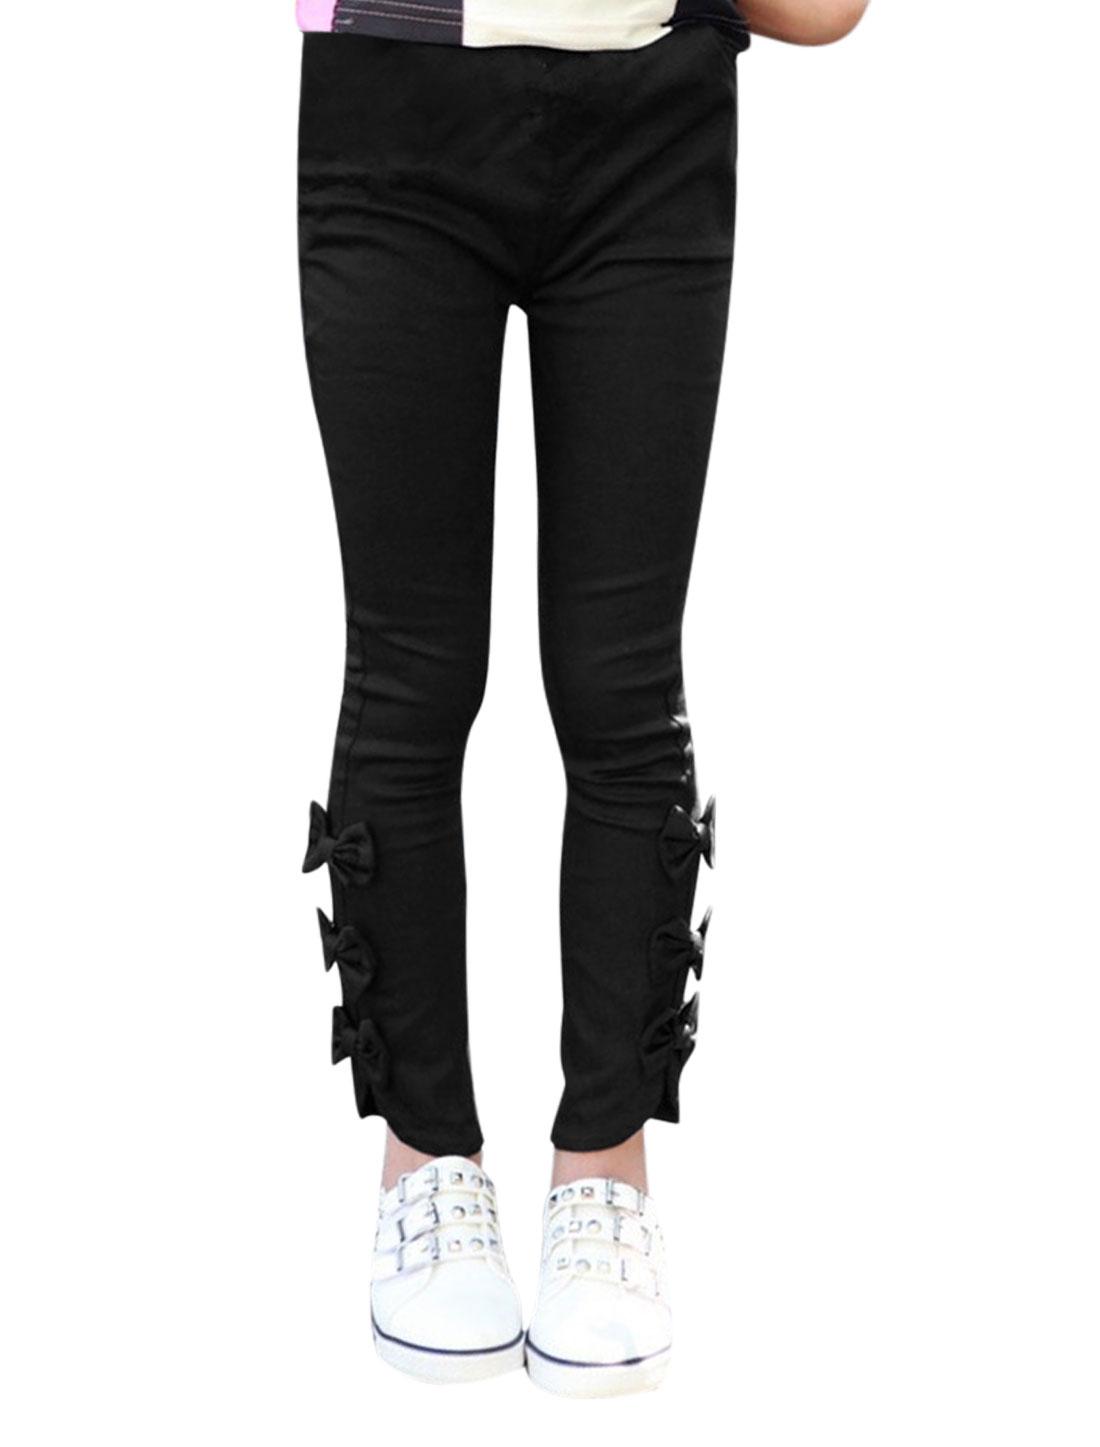 Girls Elastic Waist Slim Fit Bowknot Casual Pants Allegra Kids Black 4